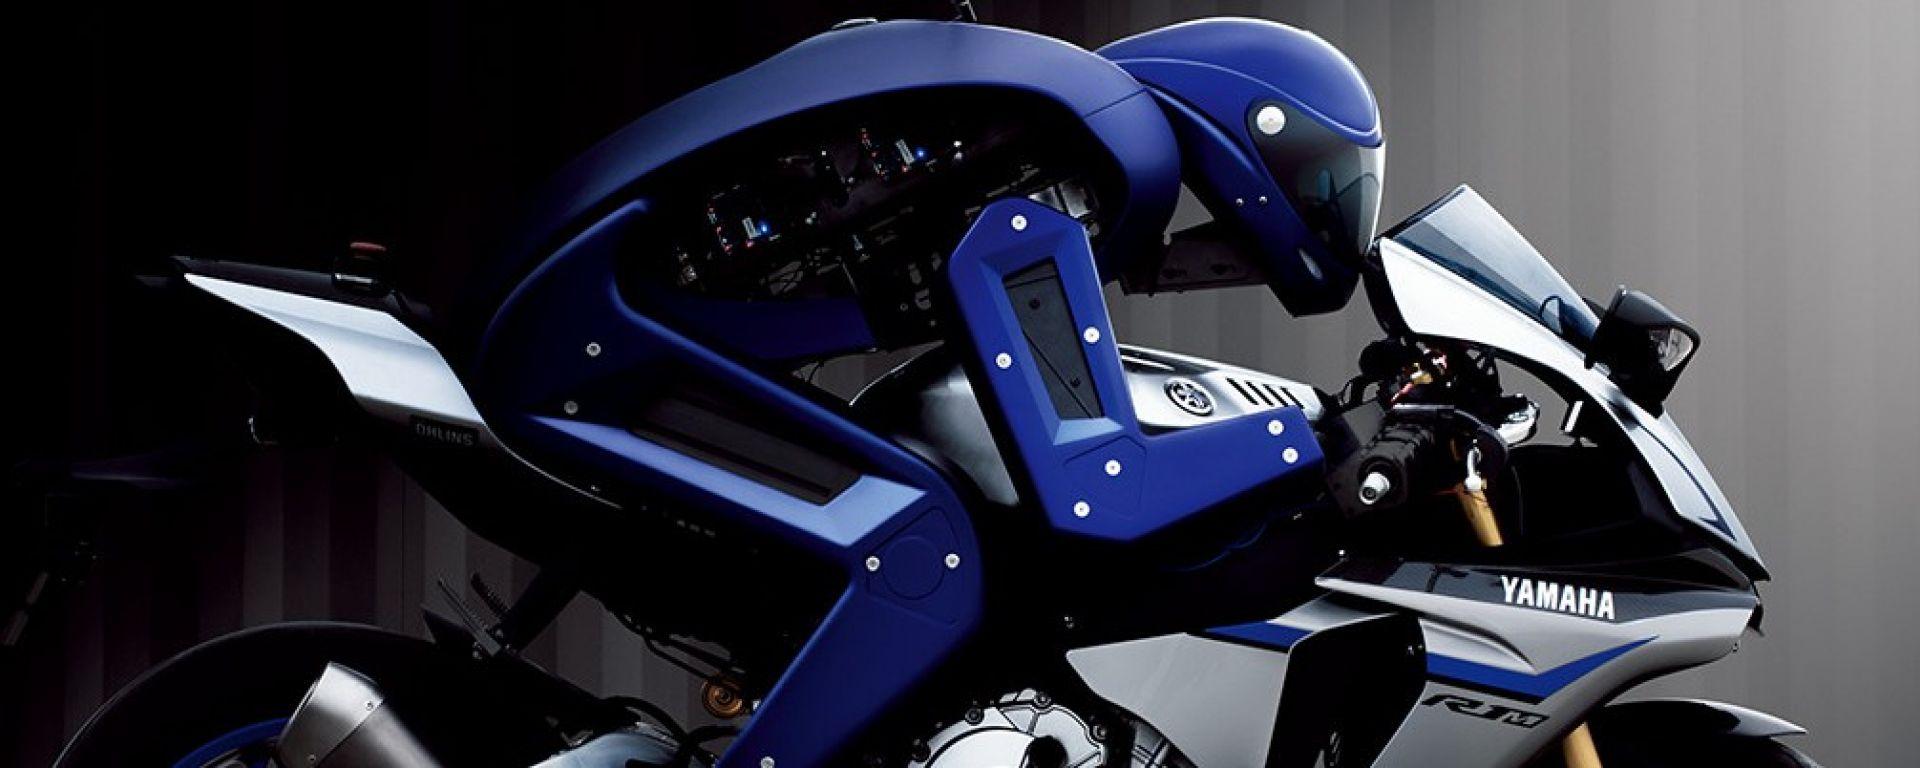 Yamaha MOTOBOT sfida Valentino Rossi